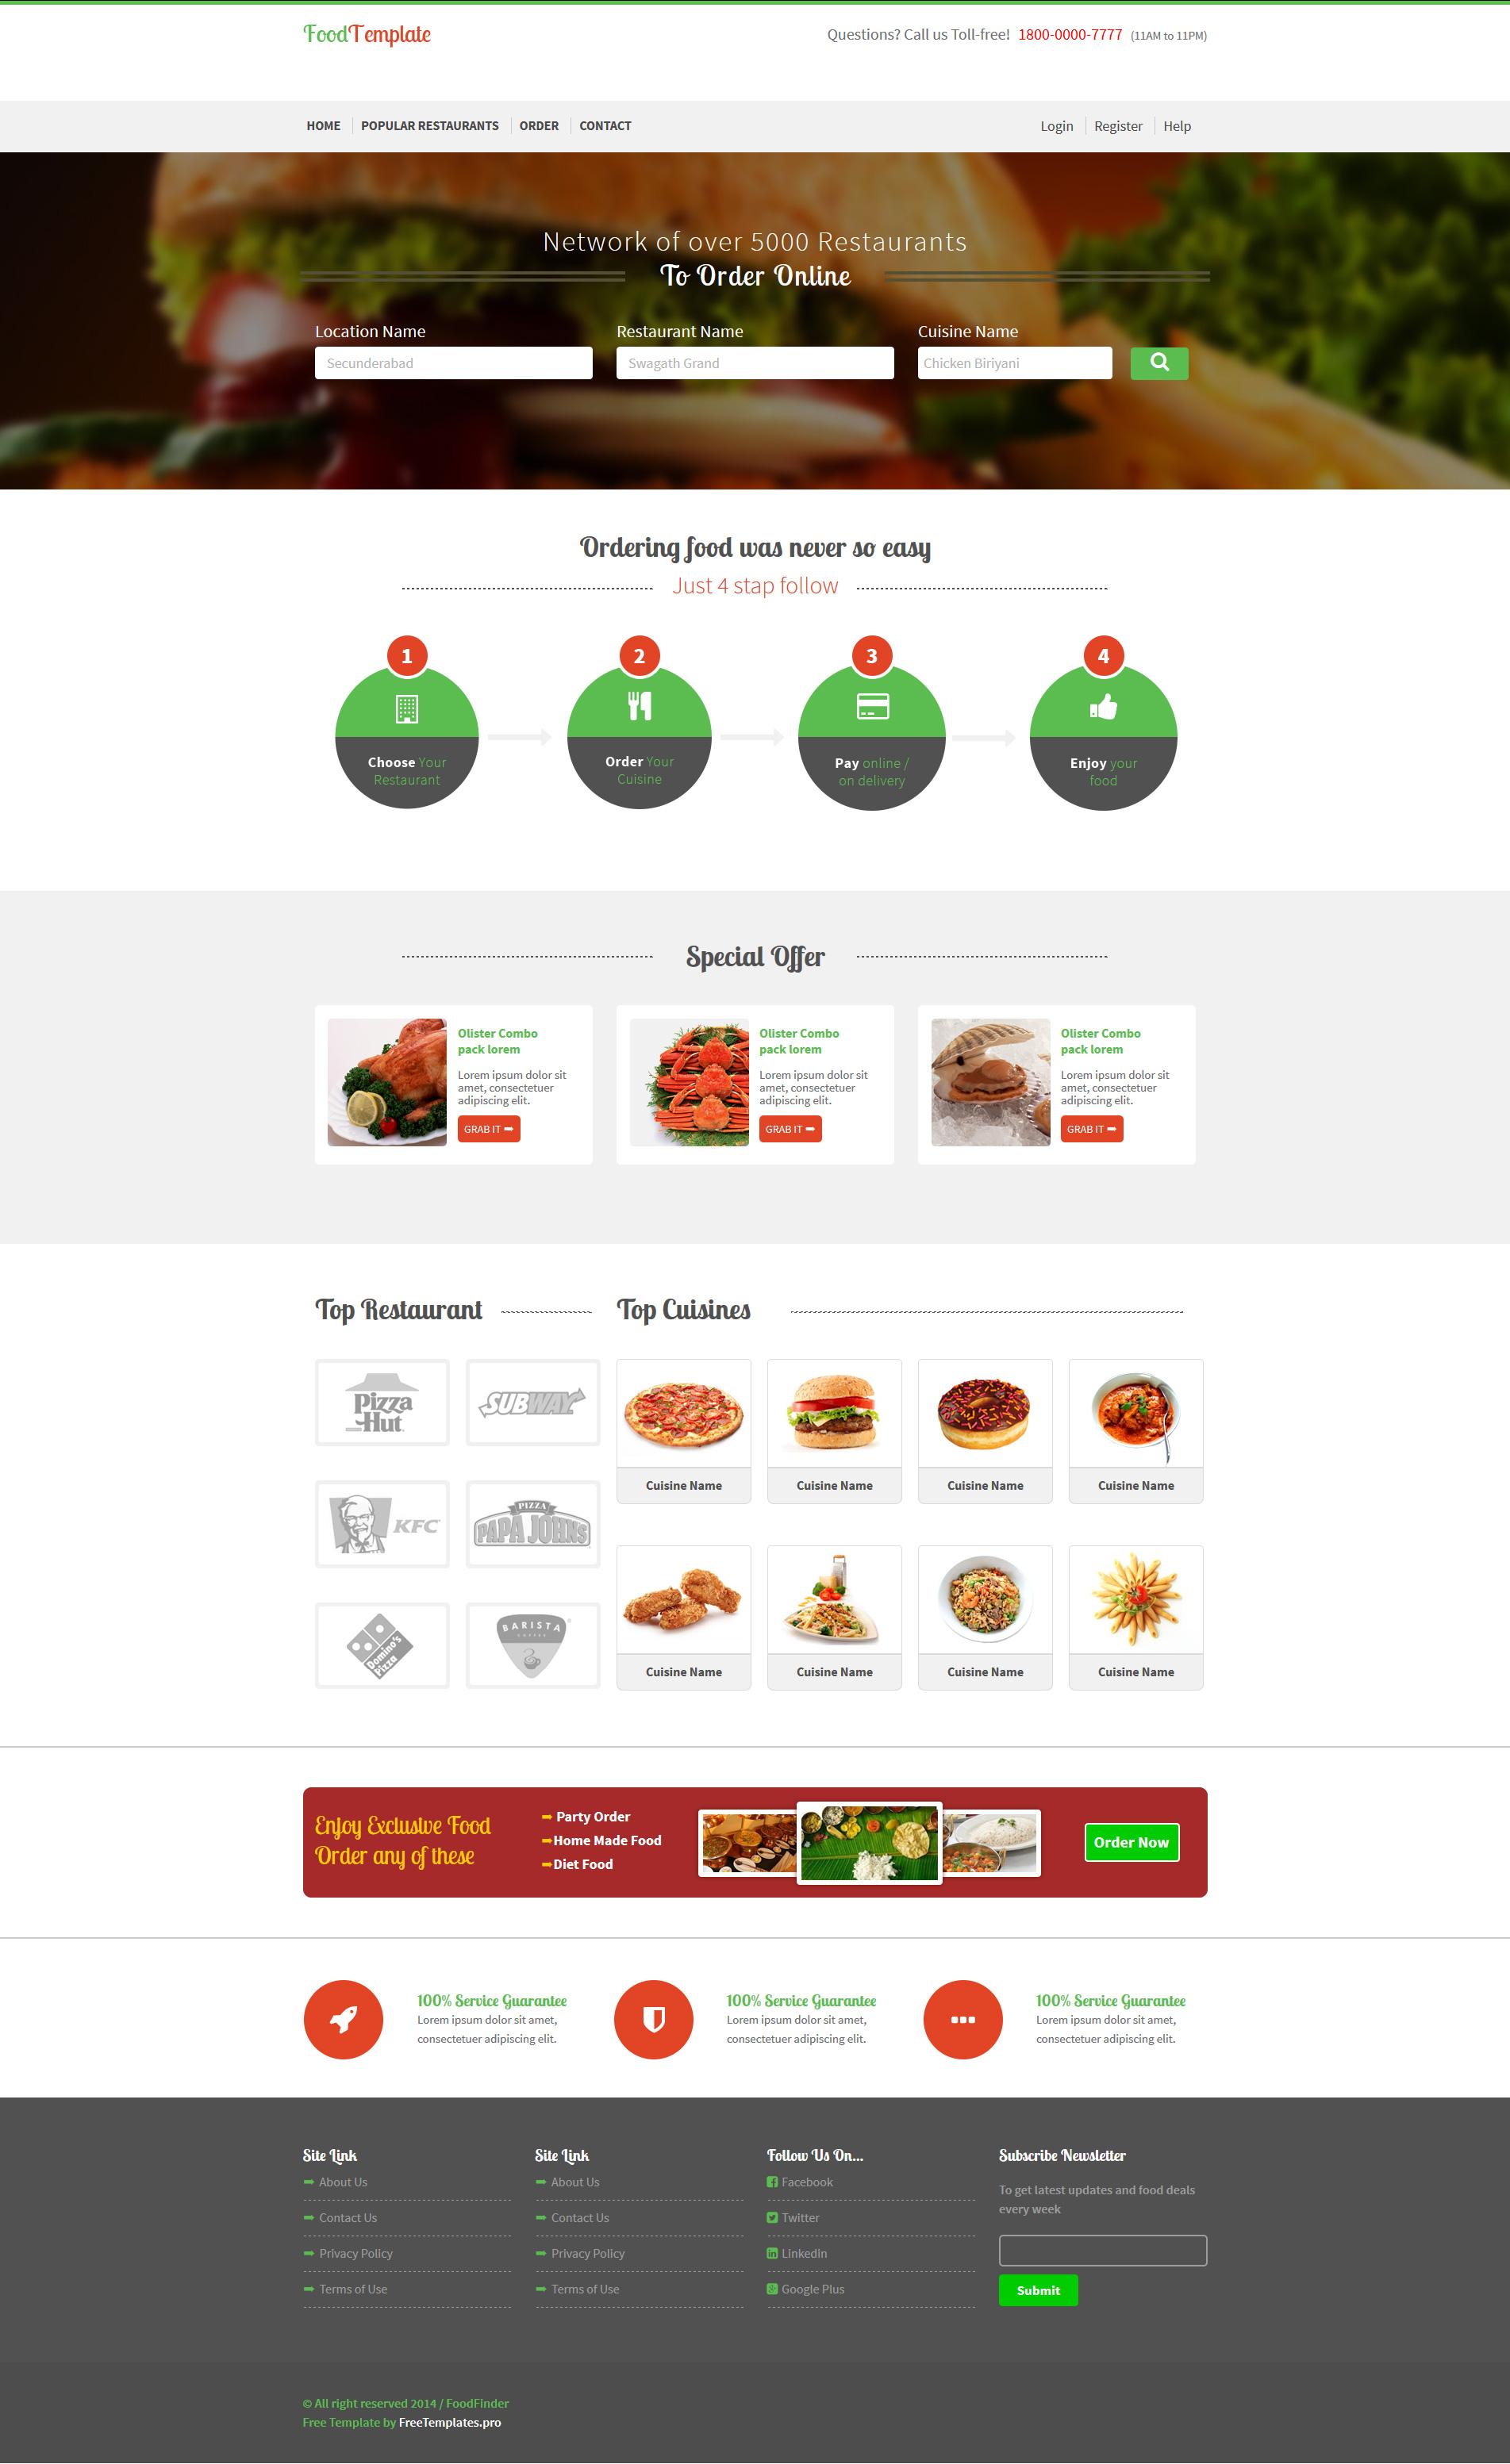 Food/Restaurant Ordering Shop Website Template HTML | Free HTML5 ...